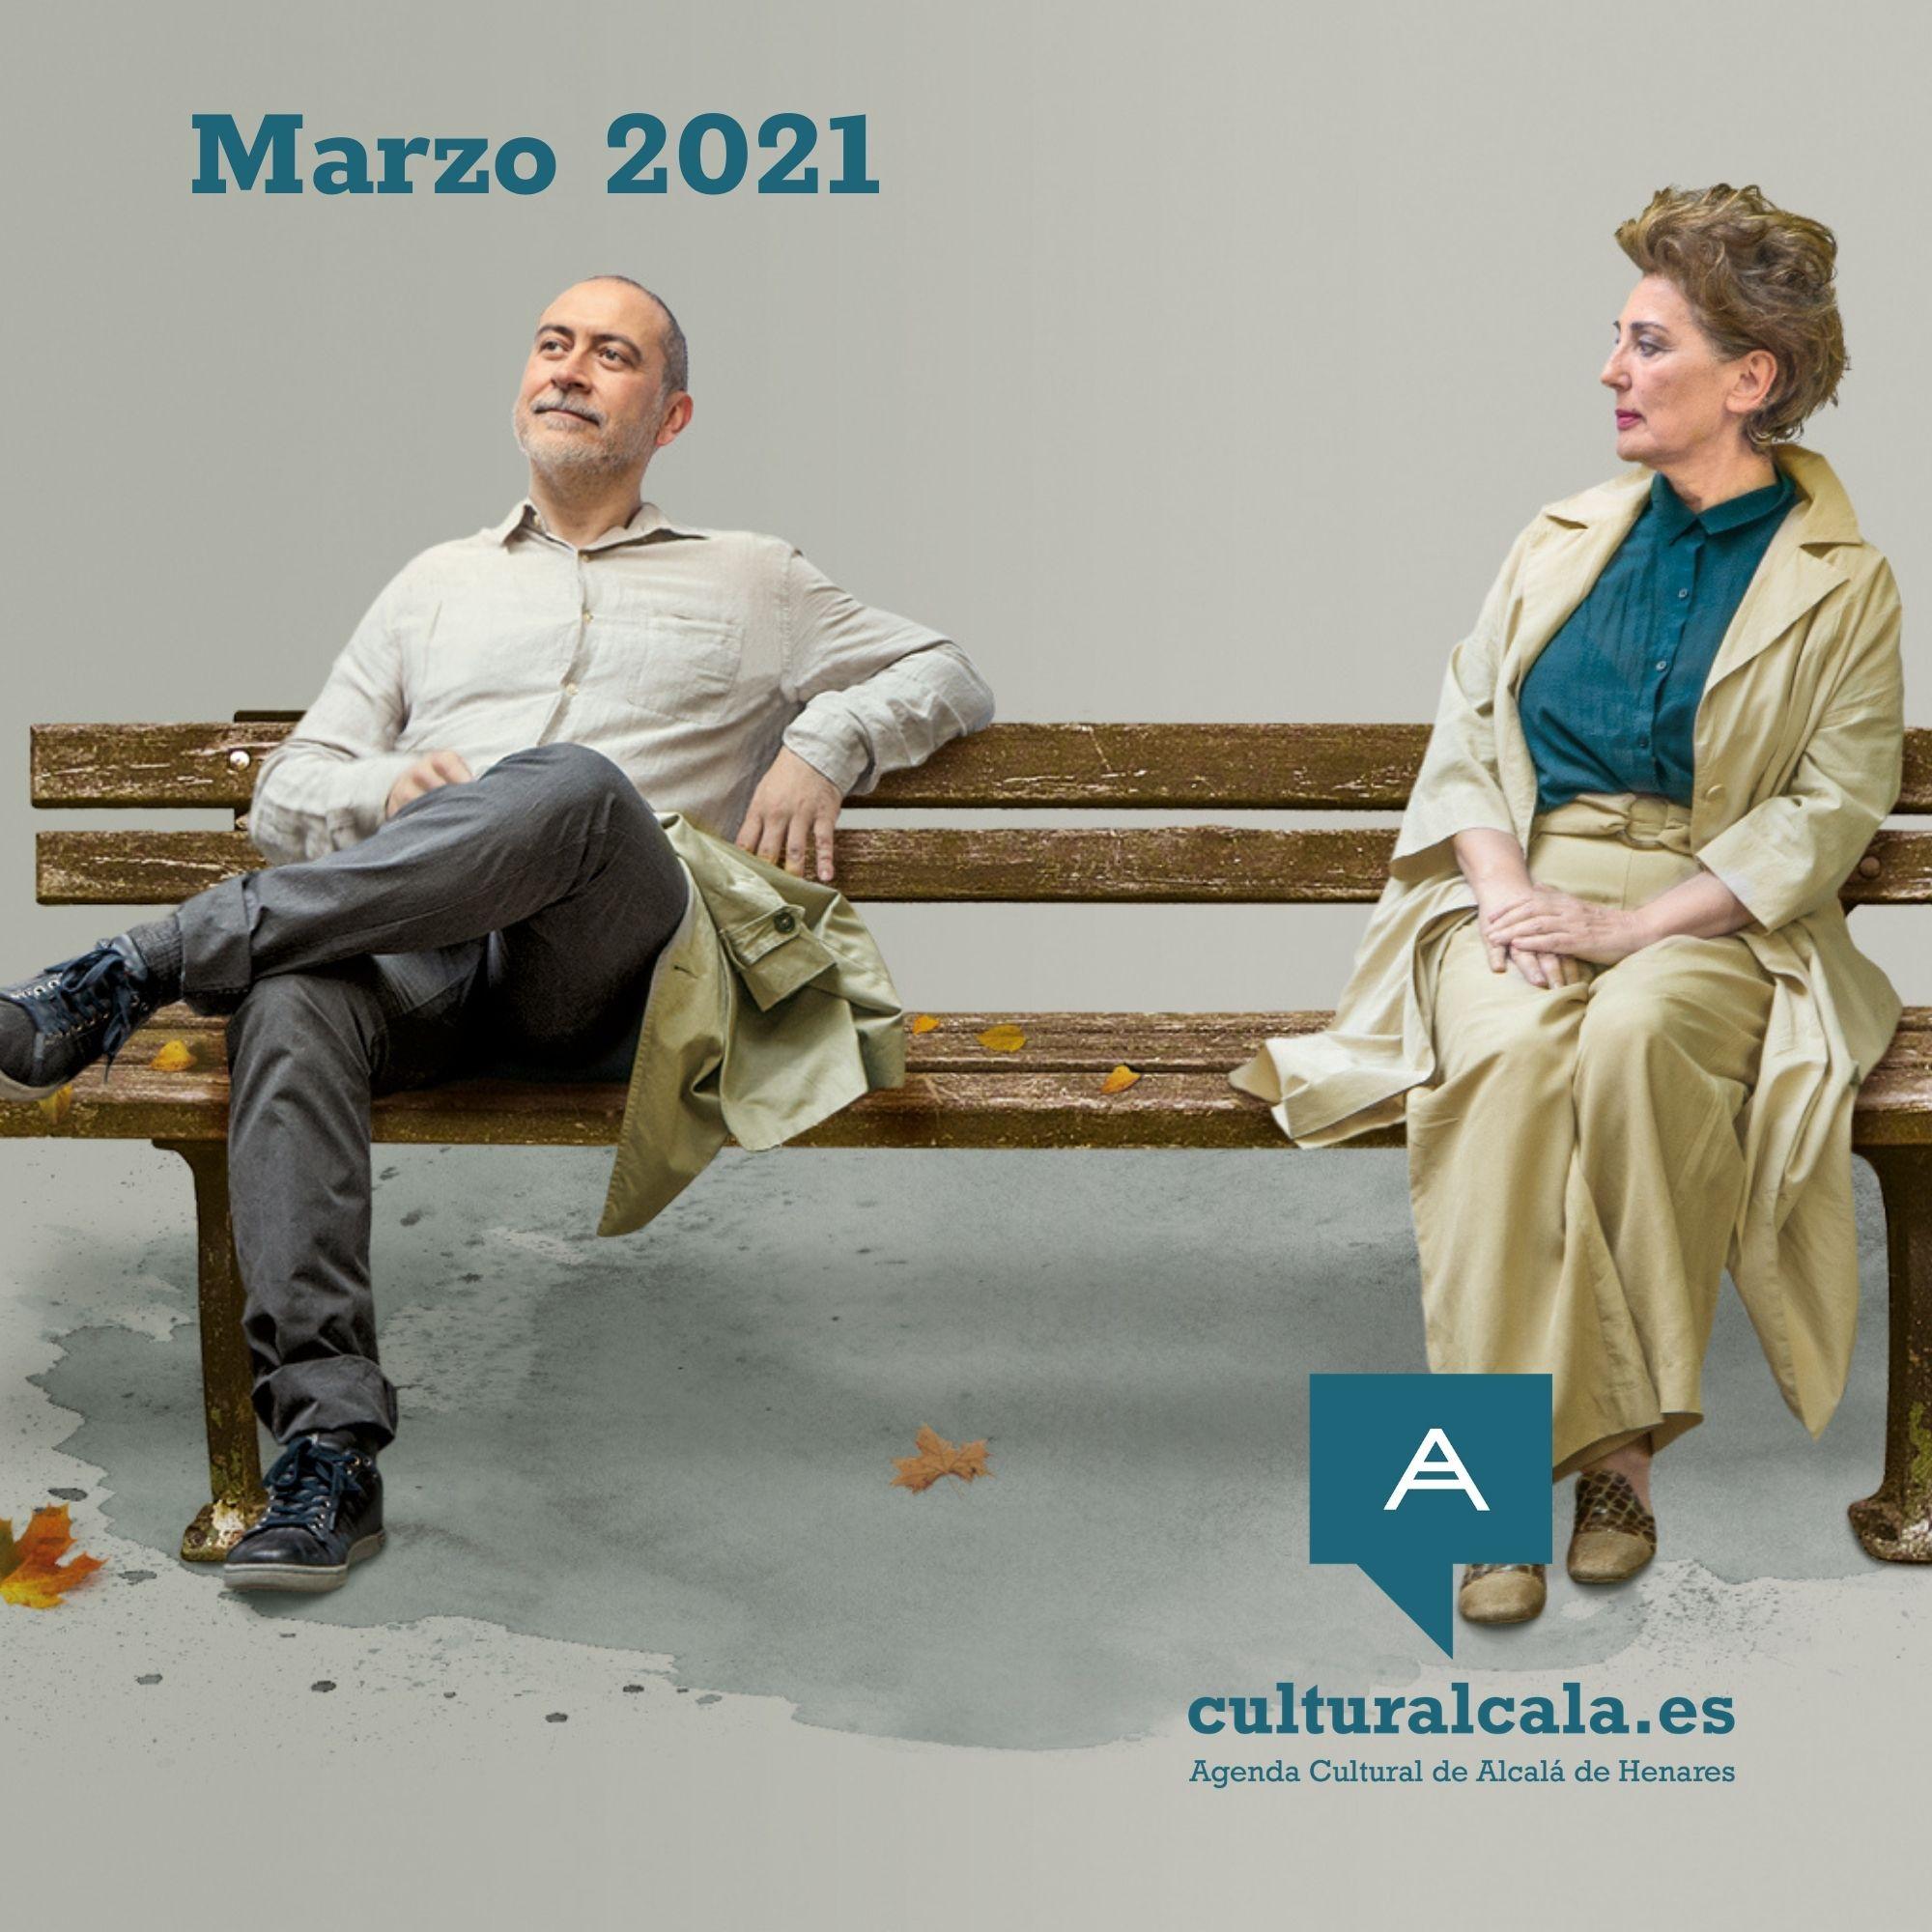 Marzo 2021